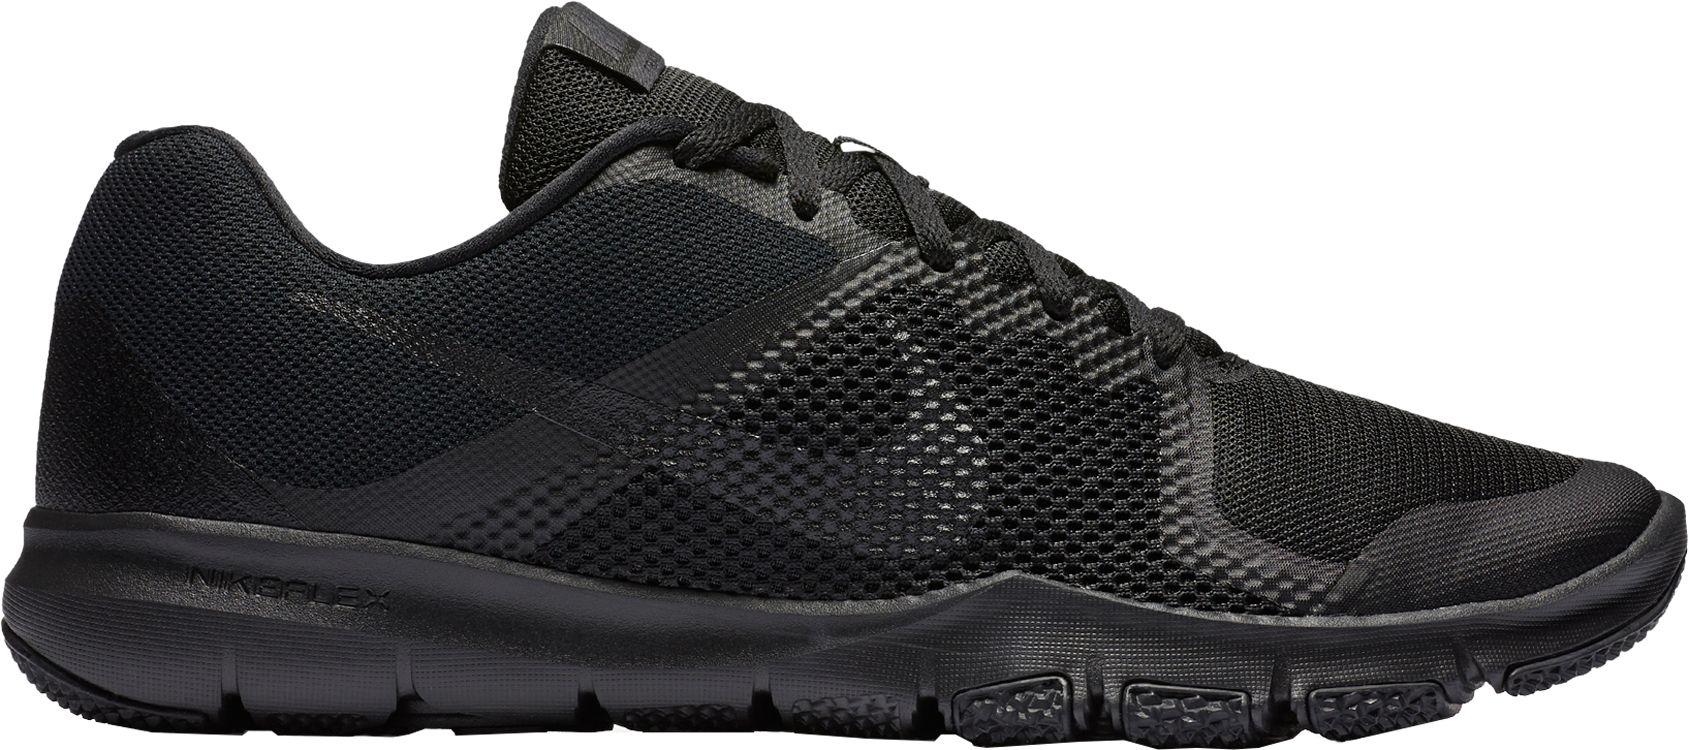 Men S Nike Flex Control Training Shoes Style